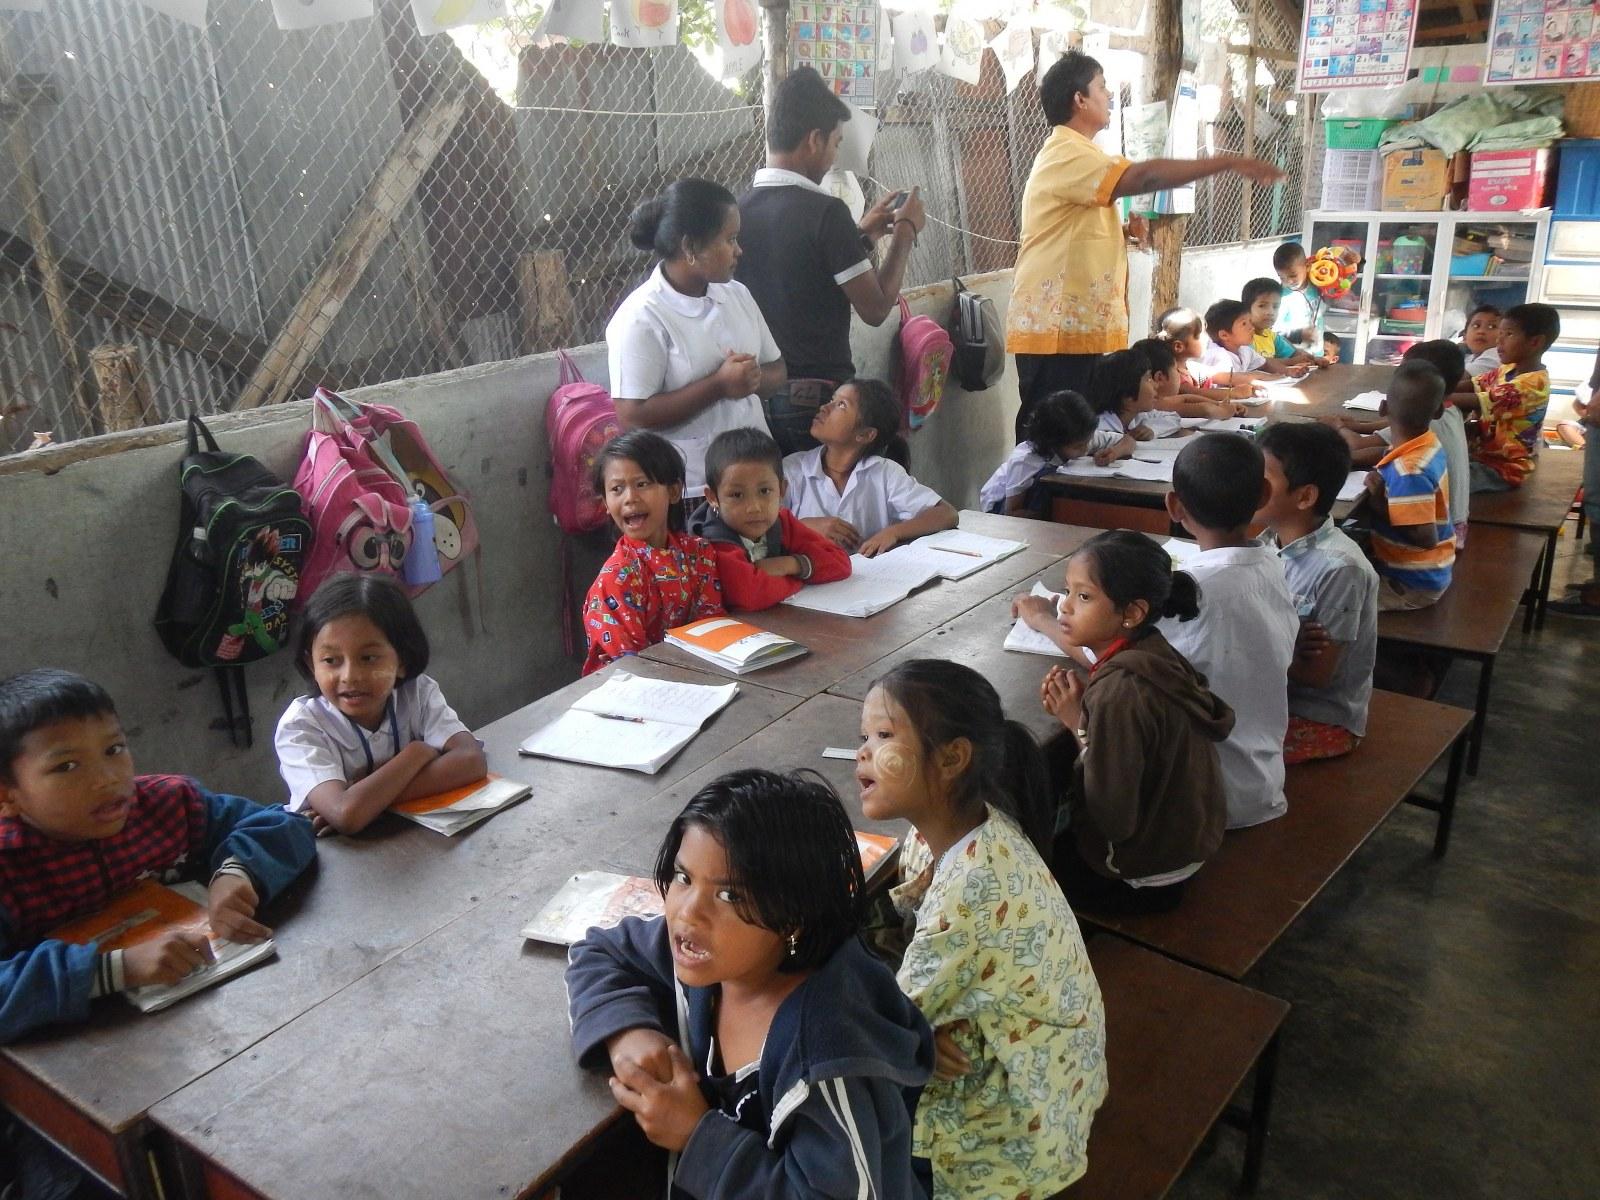 The classroom of Pyo Khin LC